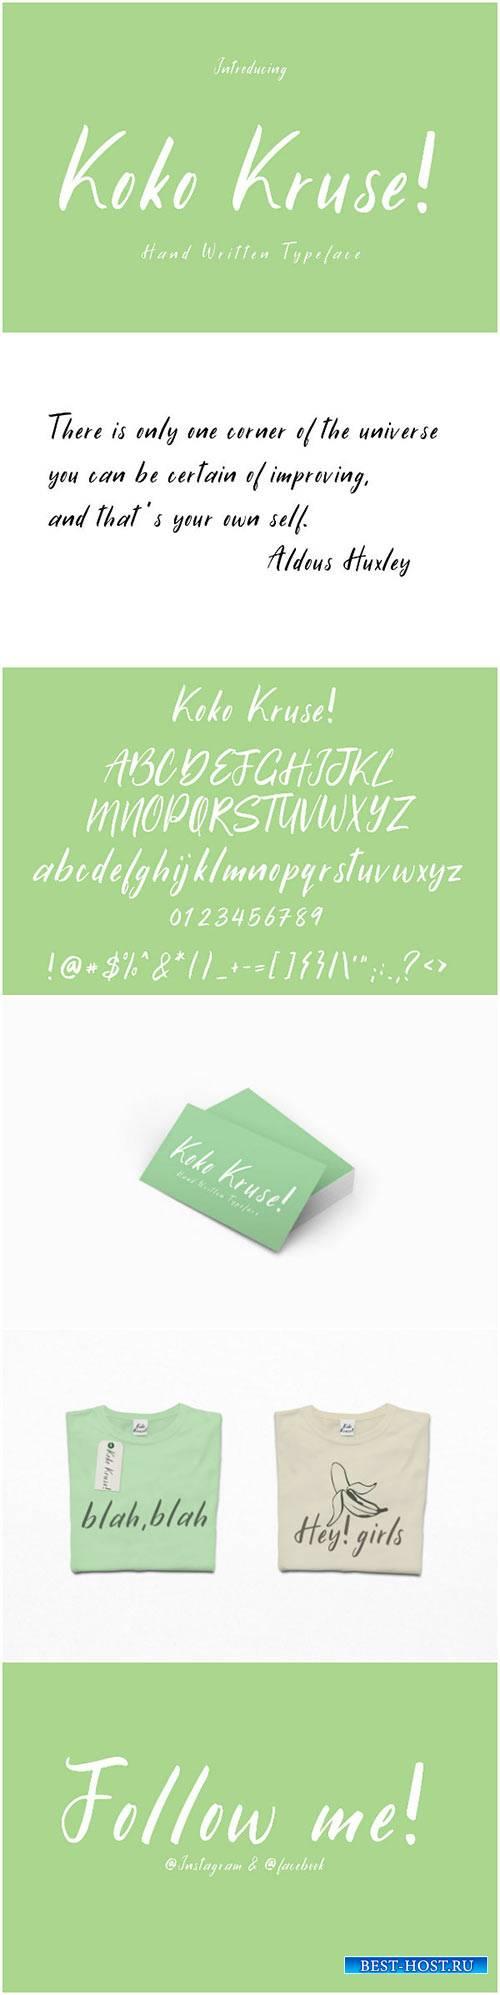 CreativeMarket Koko Kruse | Hand Written Font 1656942